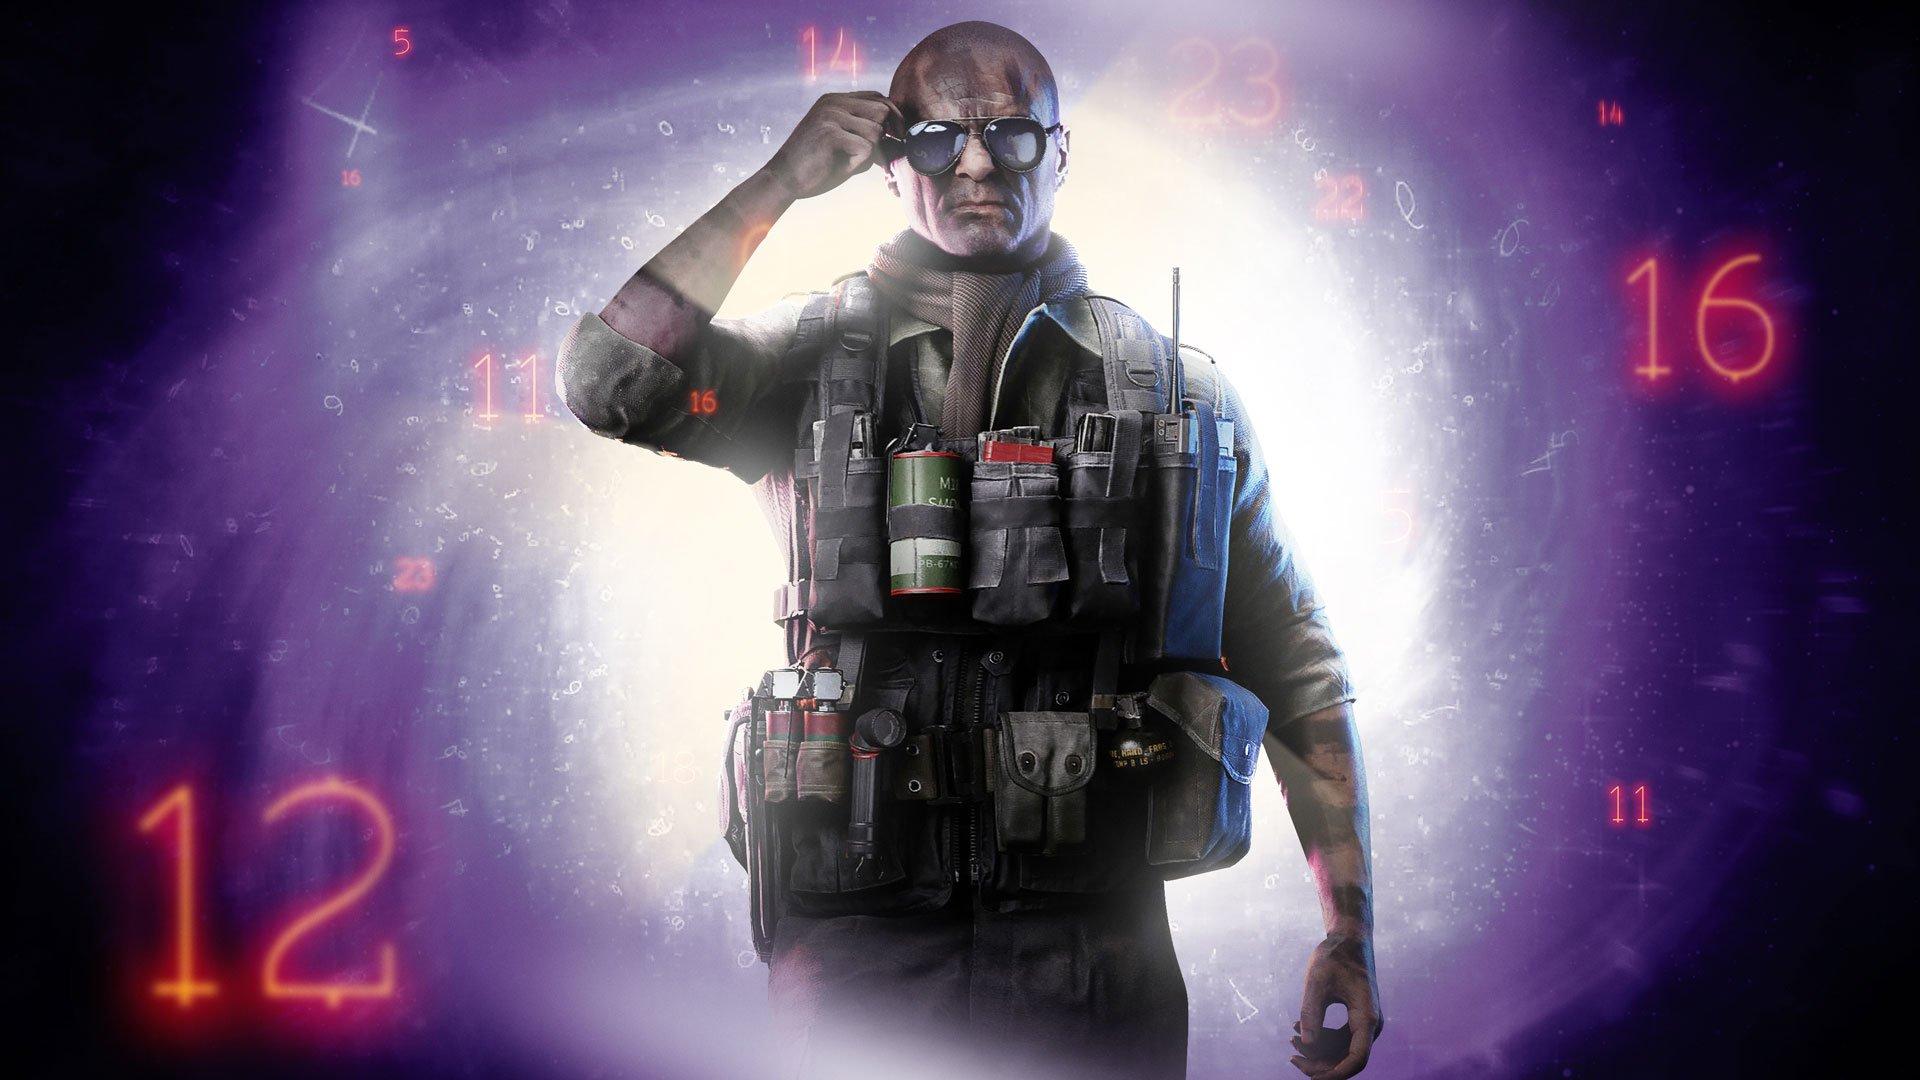 Похоже, сегодня представят новый античит для Call of Duty: Warzone